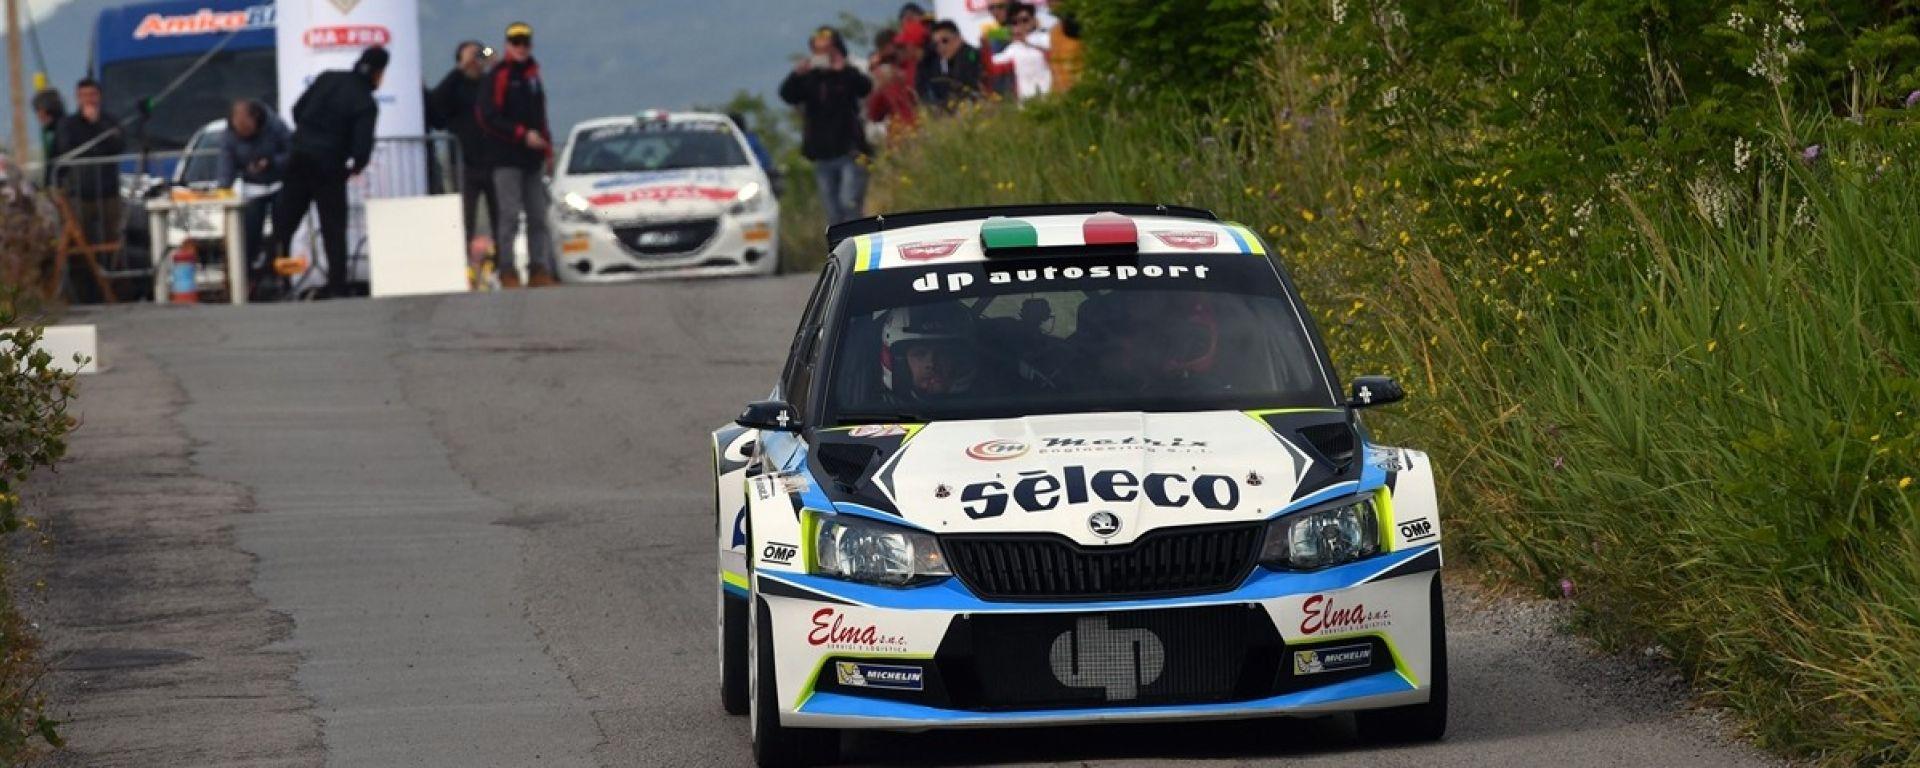 102a Targa Florio - info e risultati